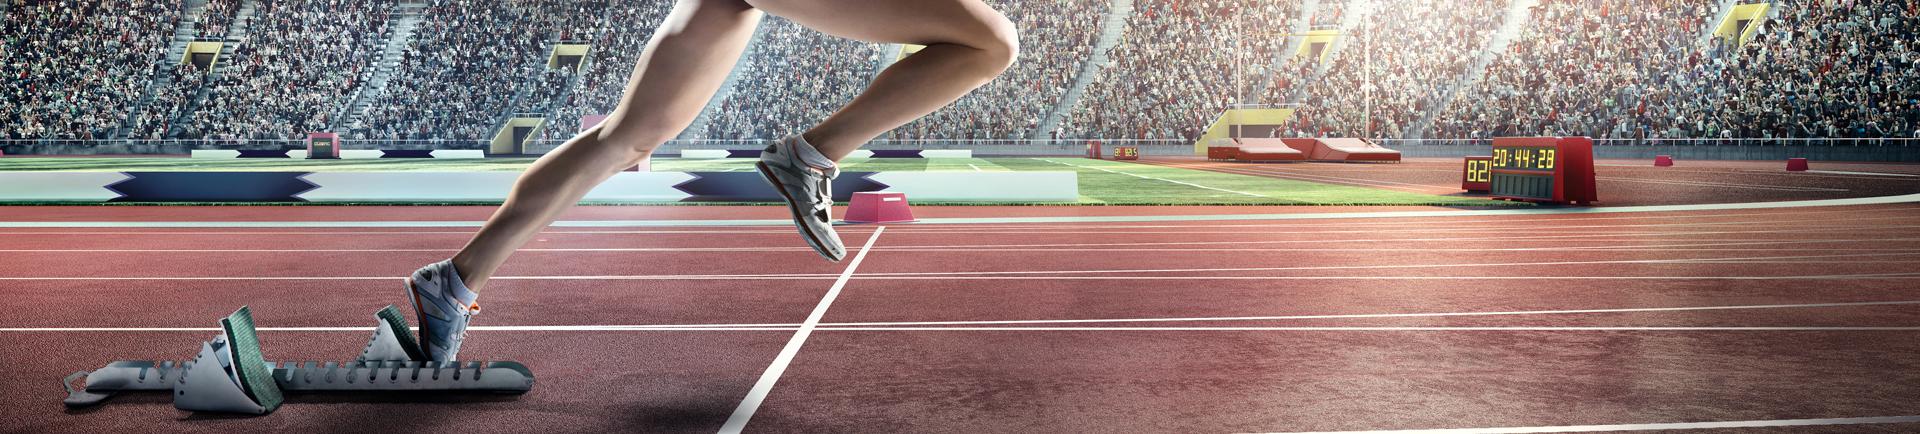 Atleta a partir de bloco de partida em pista de tartan